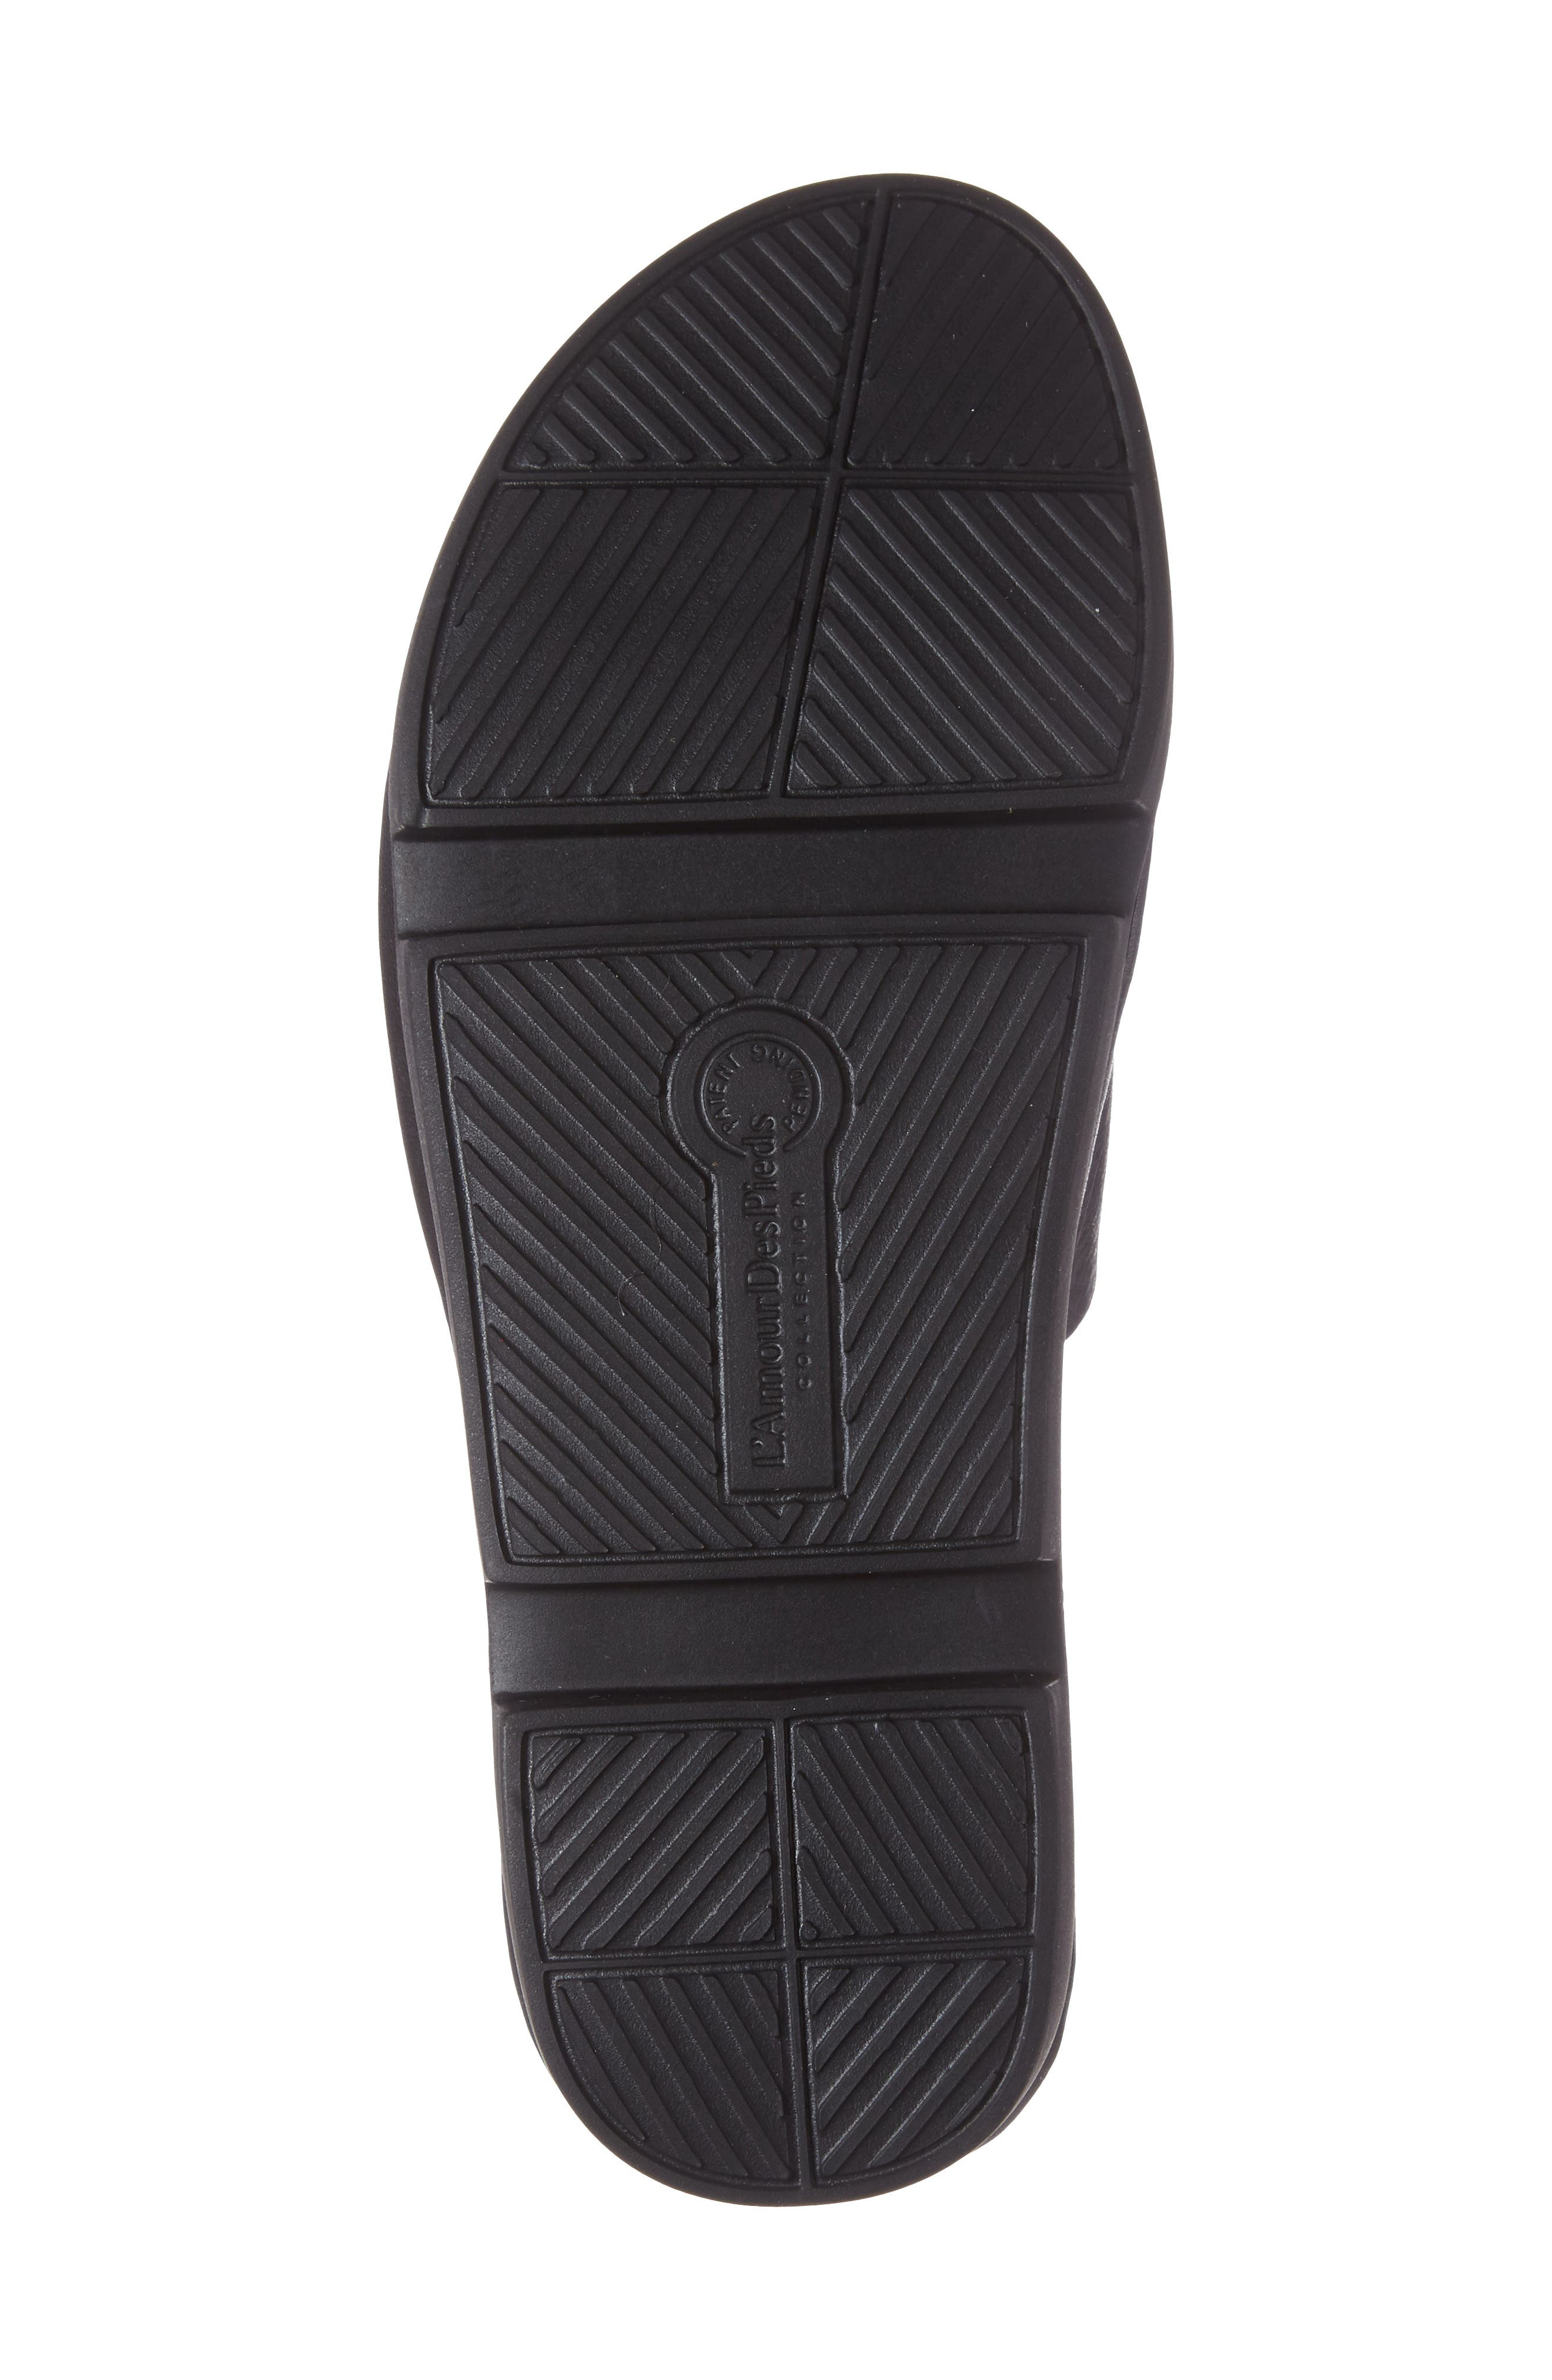 Viareggio Slide Sandal,                             Alternate thumbnail 4, color,                             BLACK LEATHER